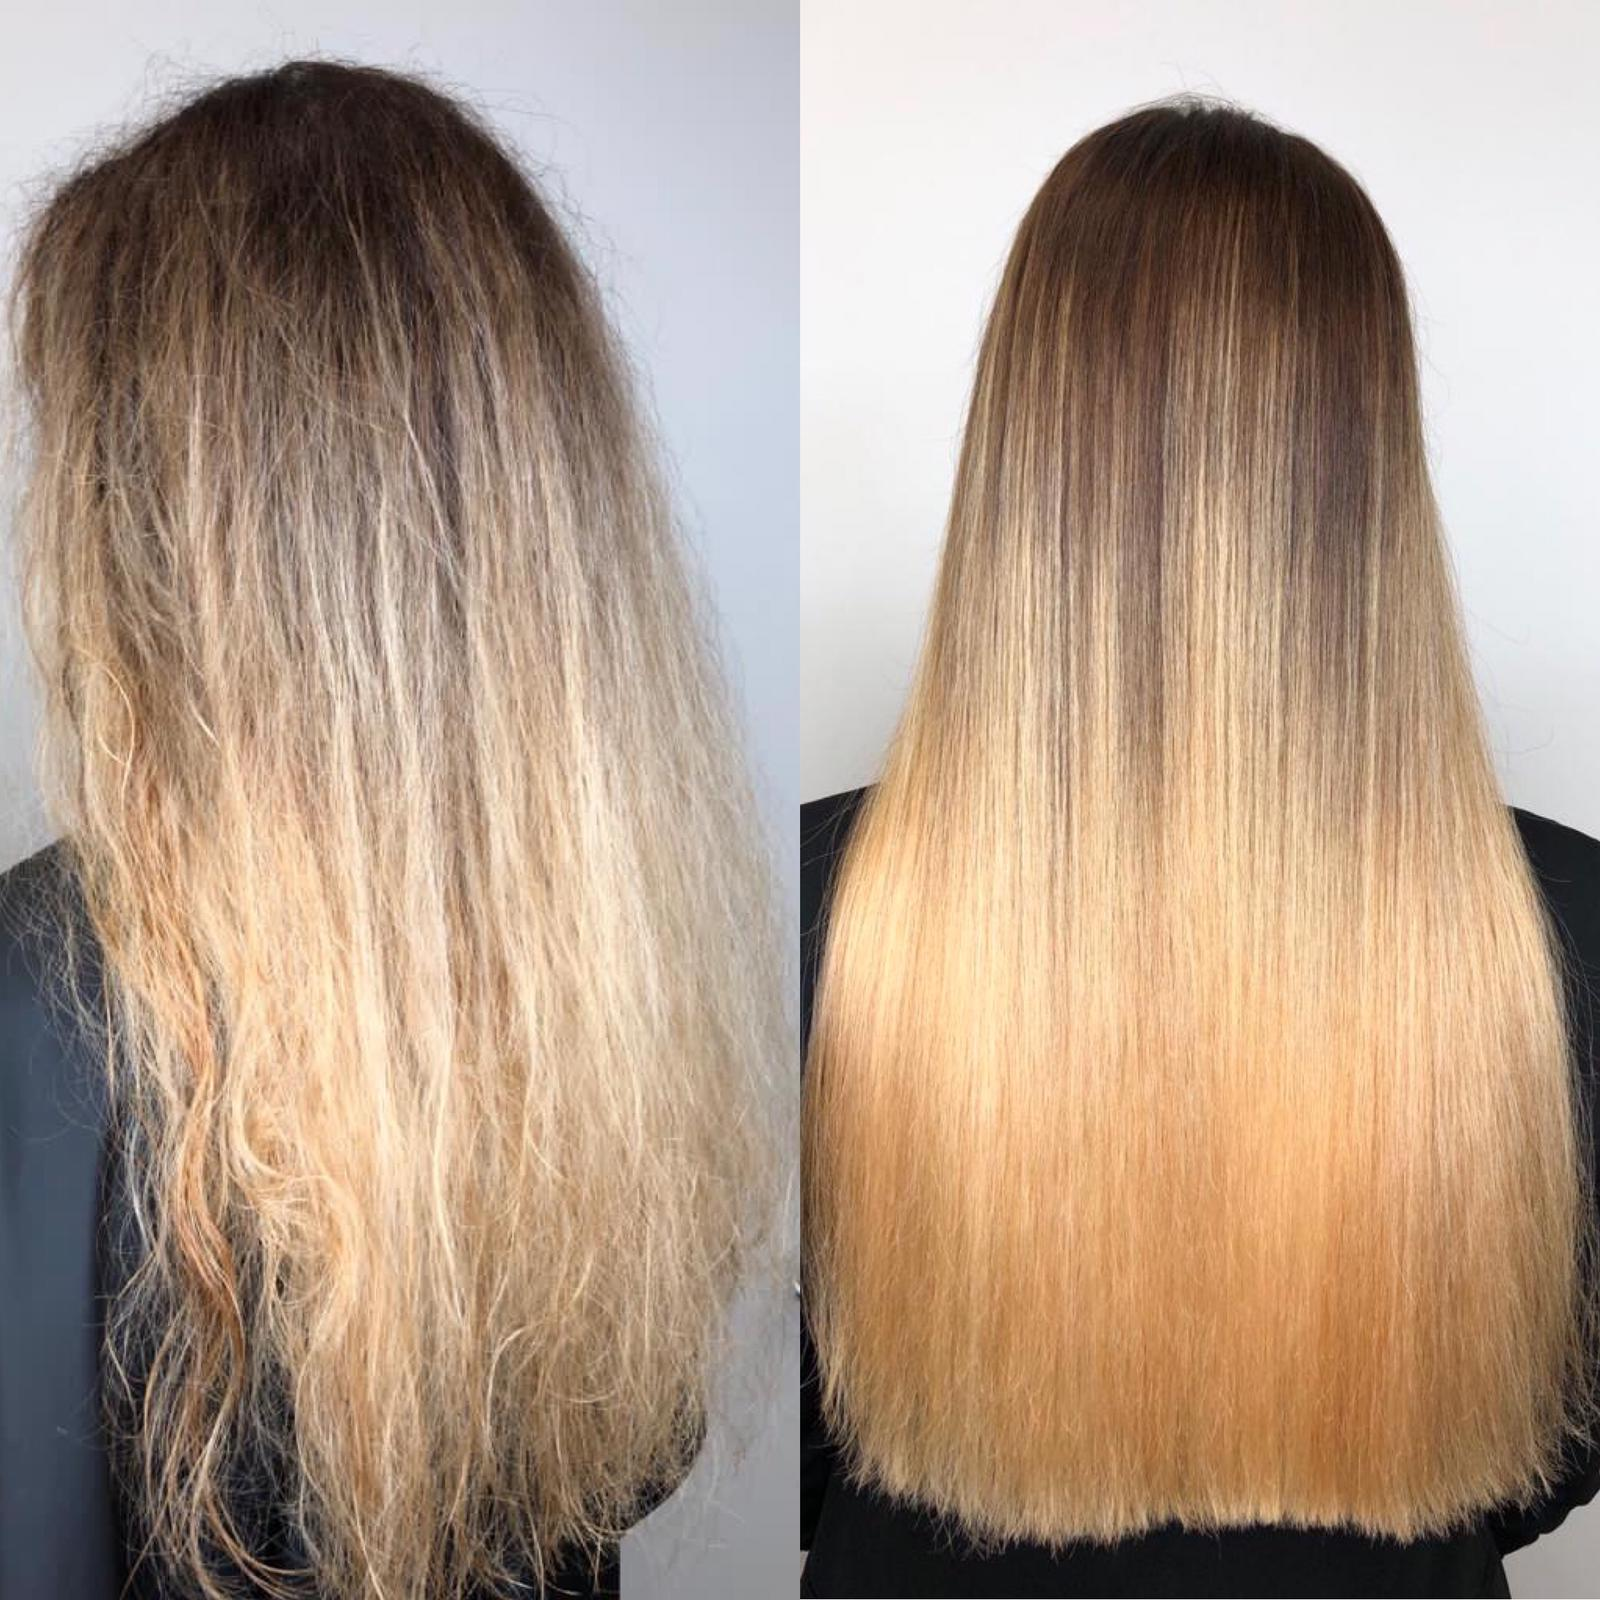 Marias Hair & Beauty Salon Ihr Friseur in Augsburg